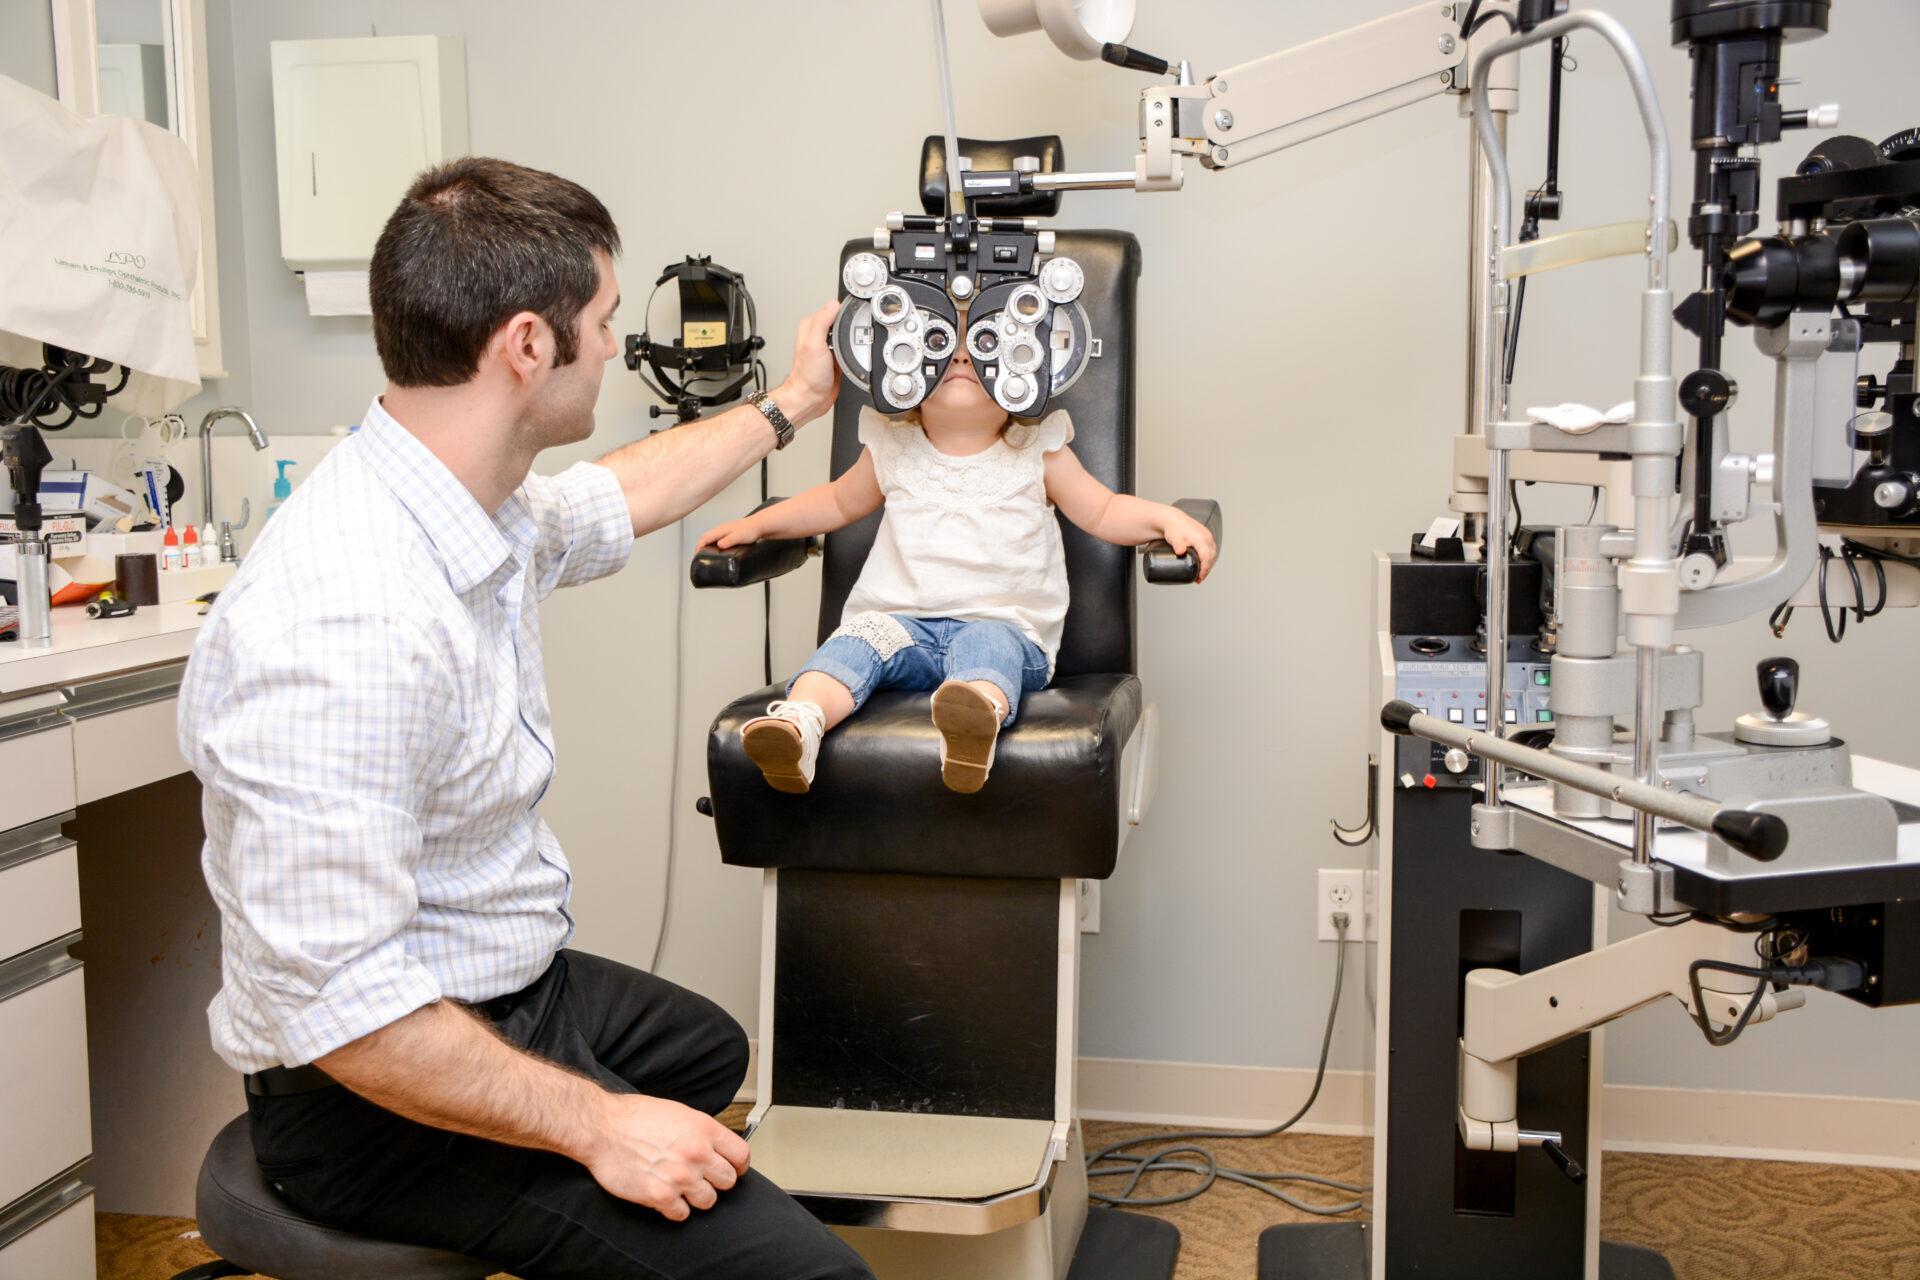 Dr. Thirion a pediatric eye doctor doing a pediatric eye exam.